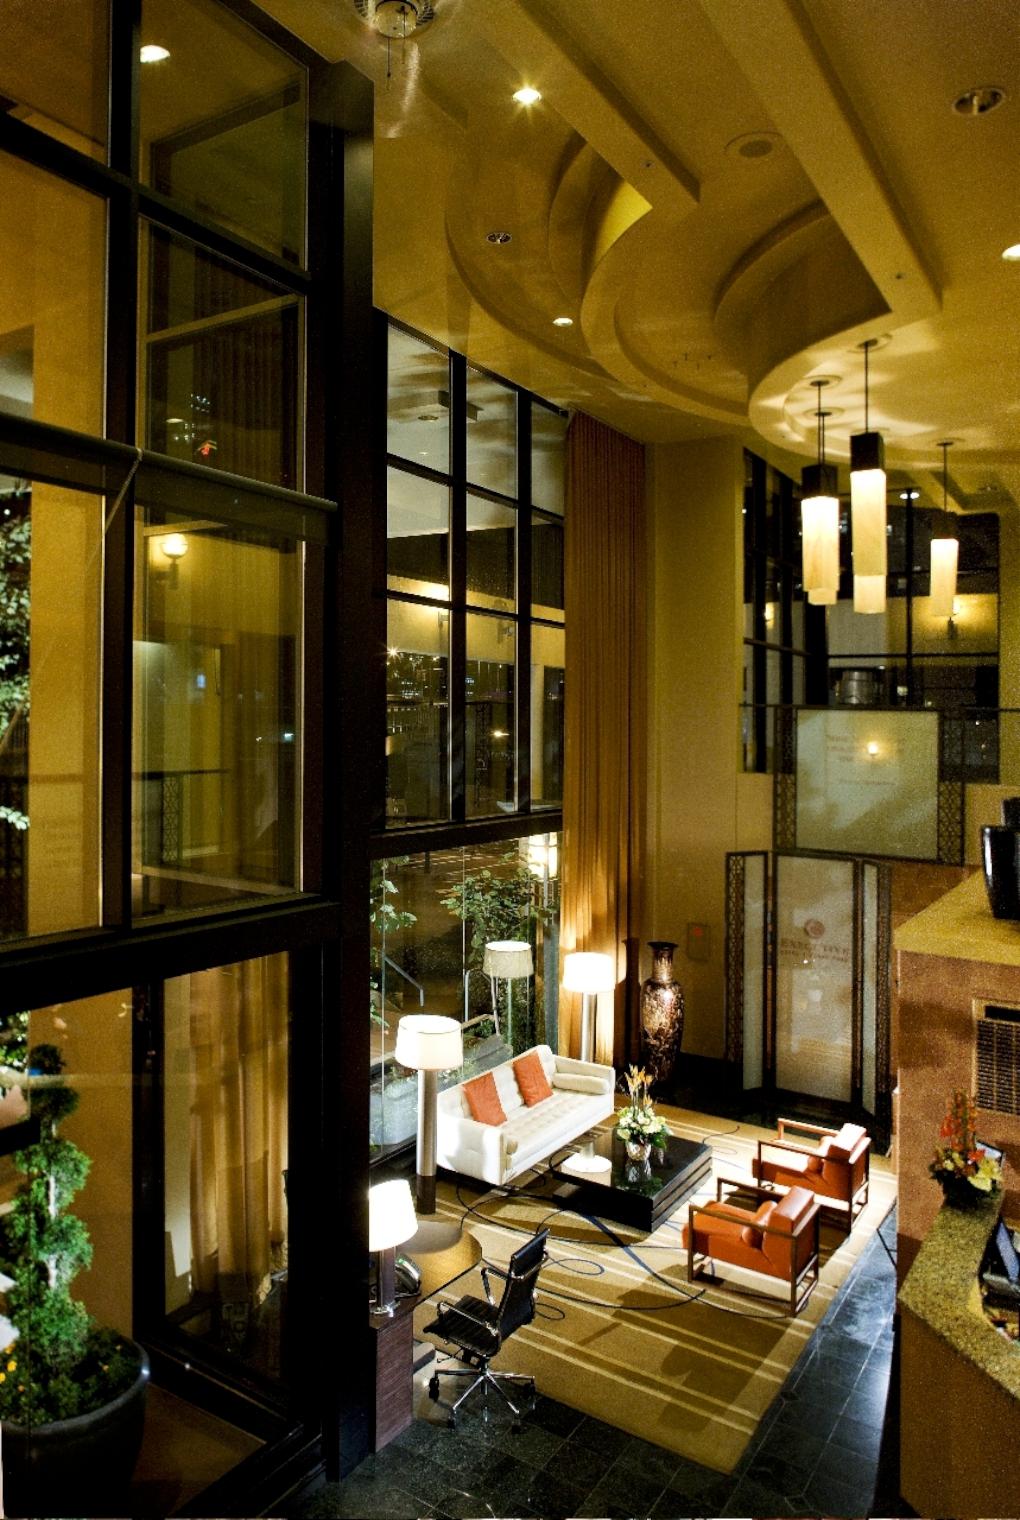 executive hotel vintage park vancouver canadian affair. Black Bedroom Furniture Sets. Home Design Ideas